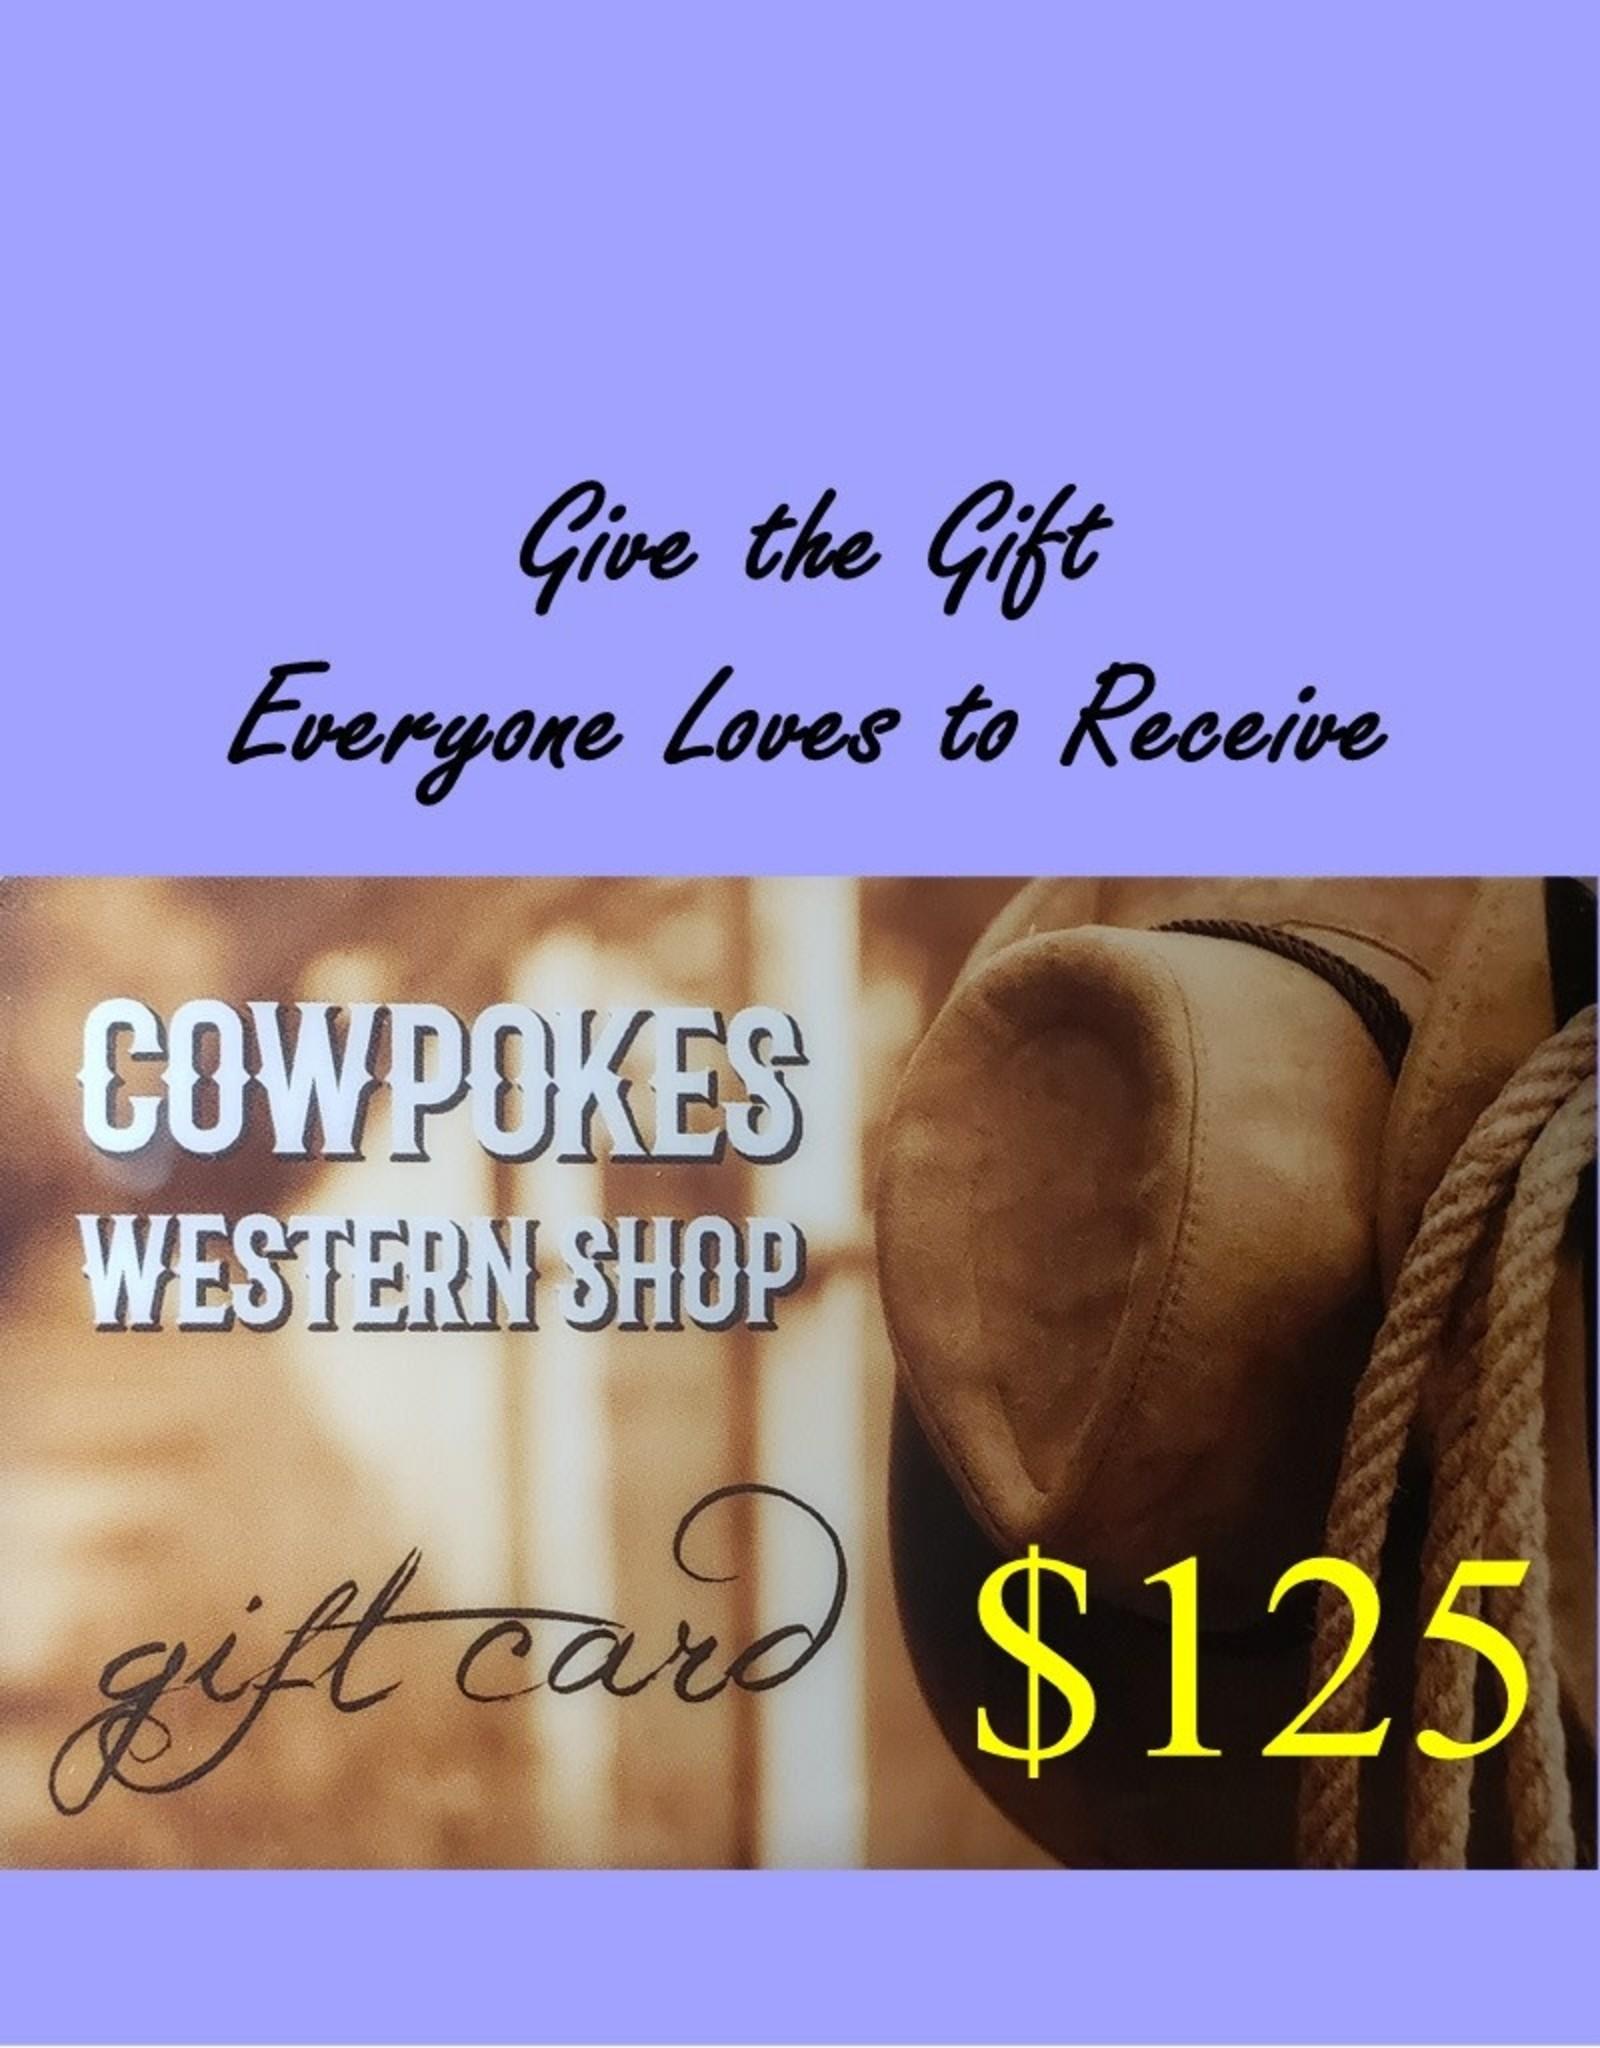 Cowpokes Western Shop Gift Card $125